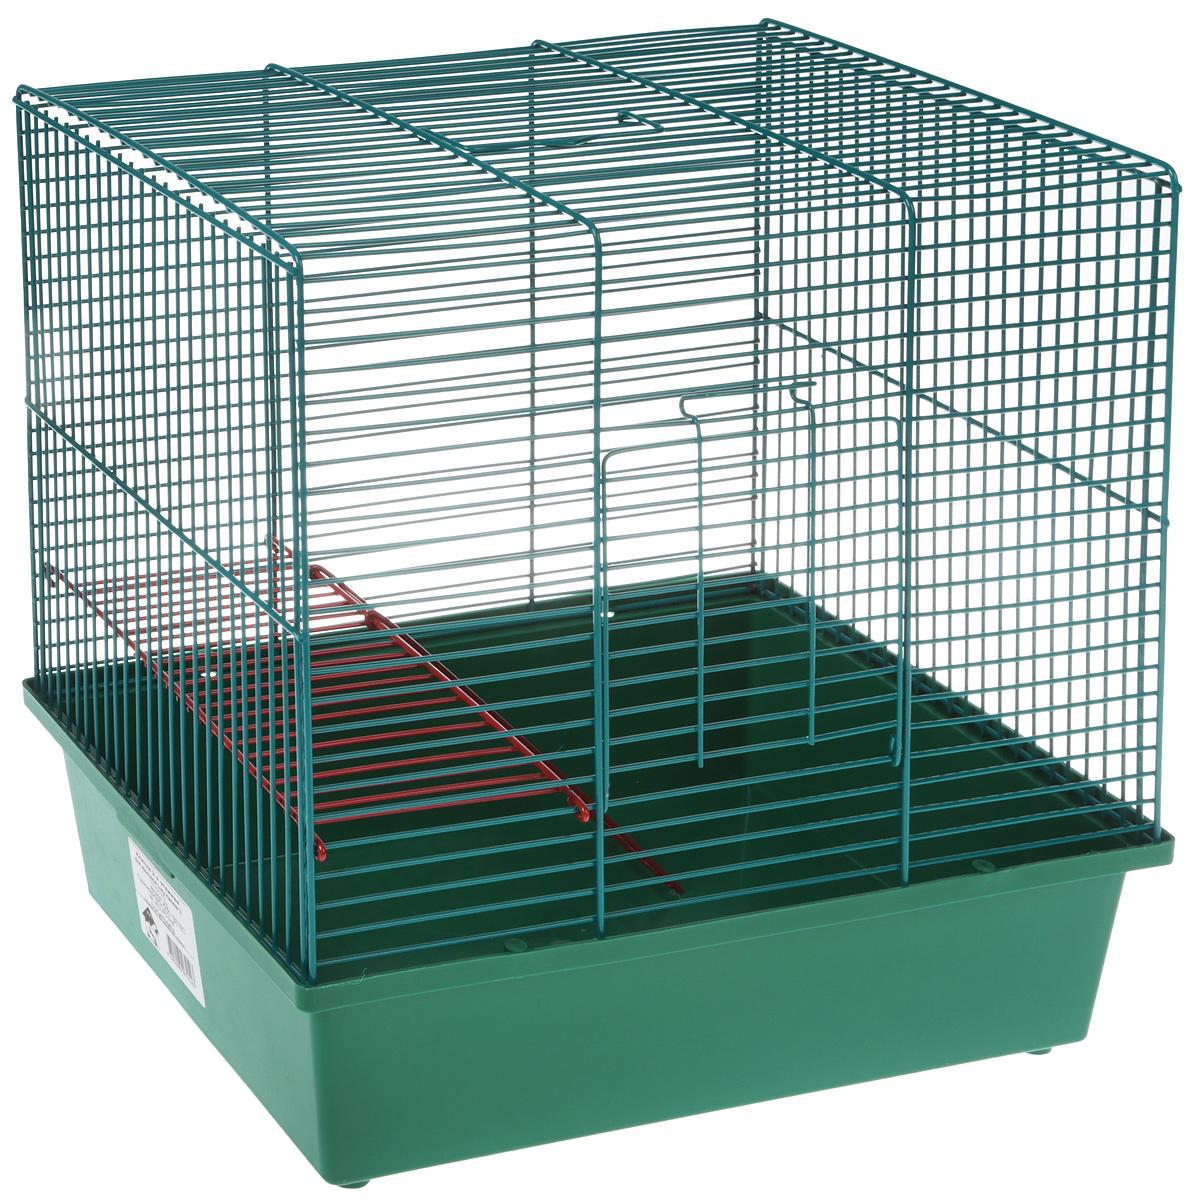 Клетка для грызунов Велес Lusy Hamster-2, 2-этажная, цвет: зеленый, бирюзовый, 35 х 26 х 26 см клетка для грызунов inter zoo teddy gigant 2 комплект для крыс 59х36х56см o c